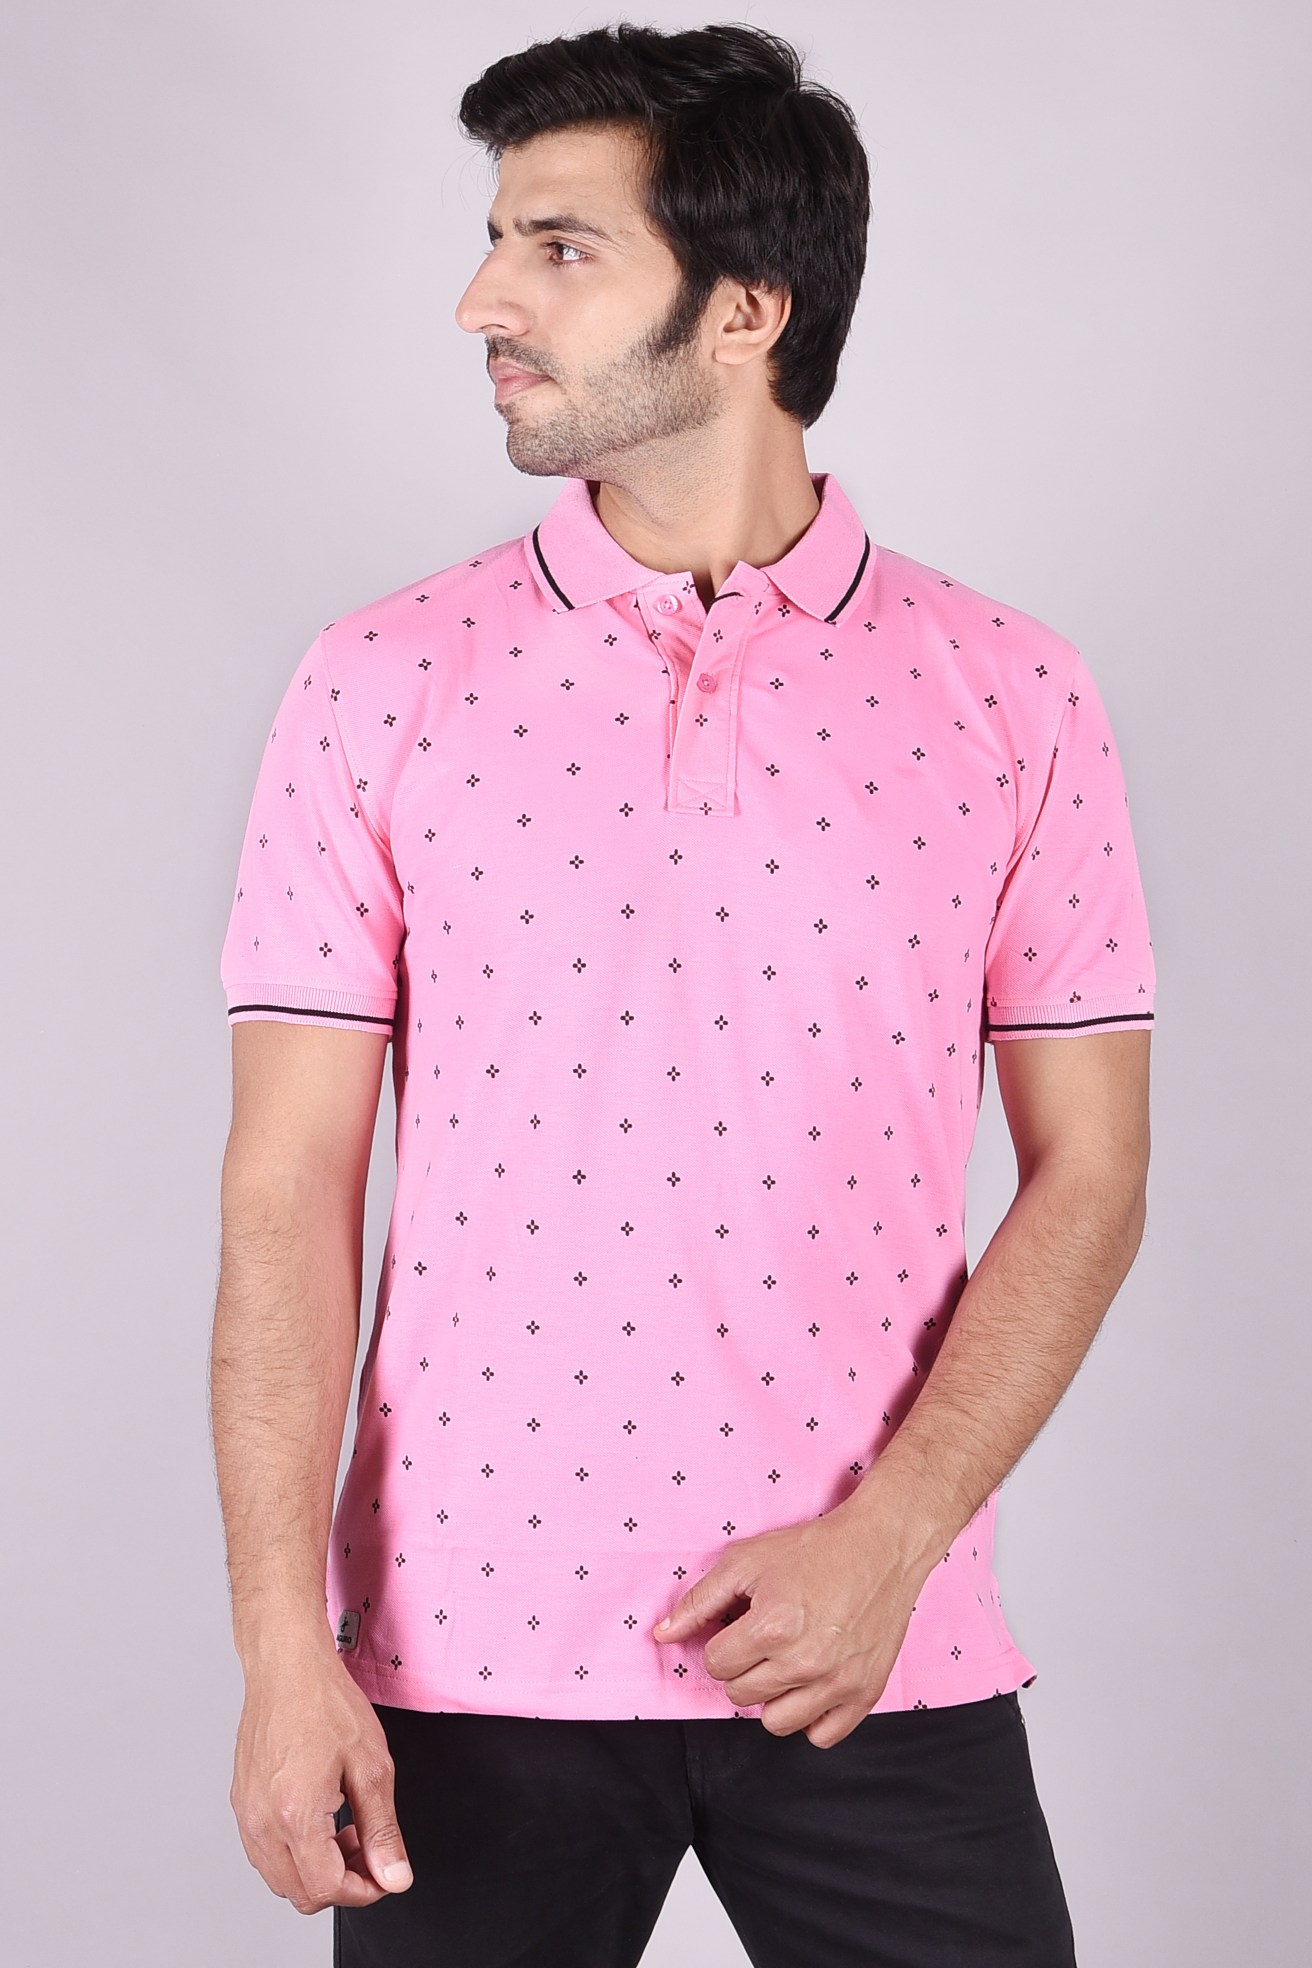 JAGURO | Stylish casual Printed cotton collar T-shirt.